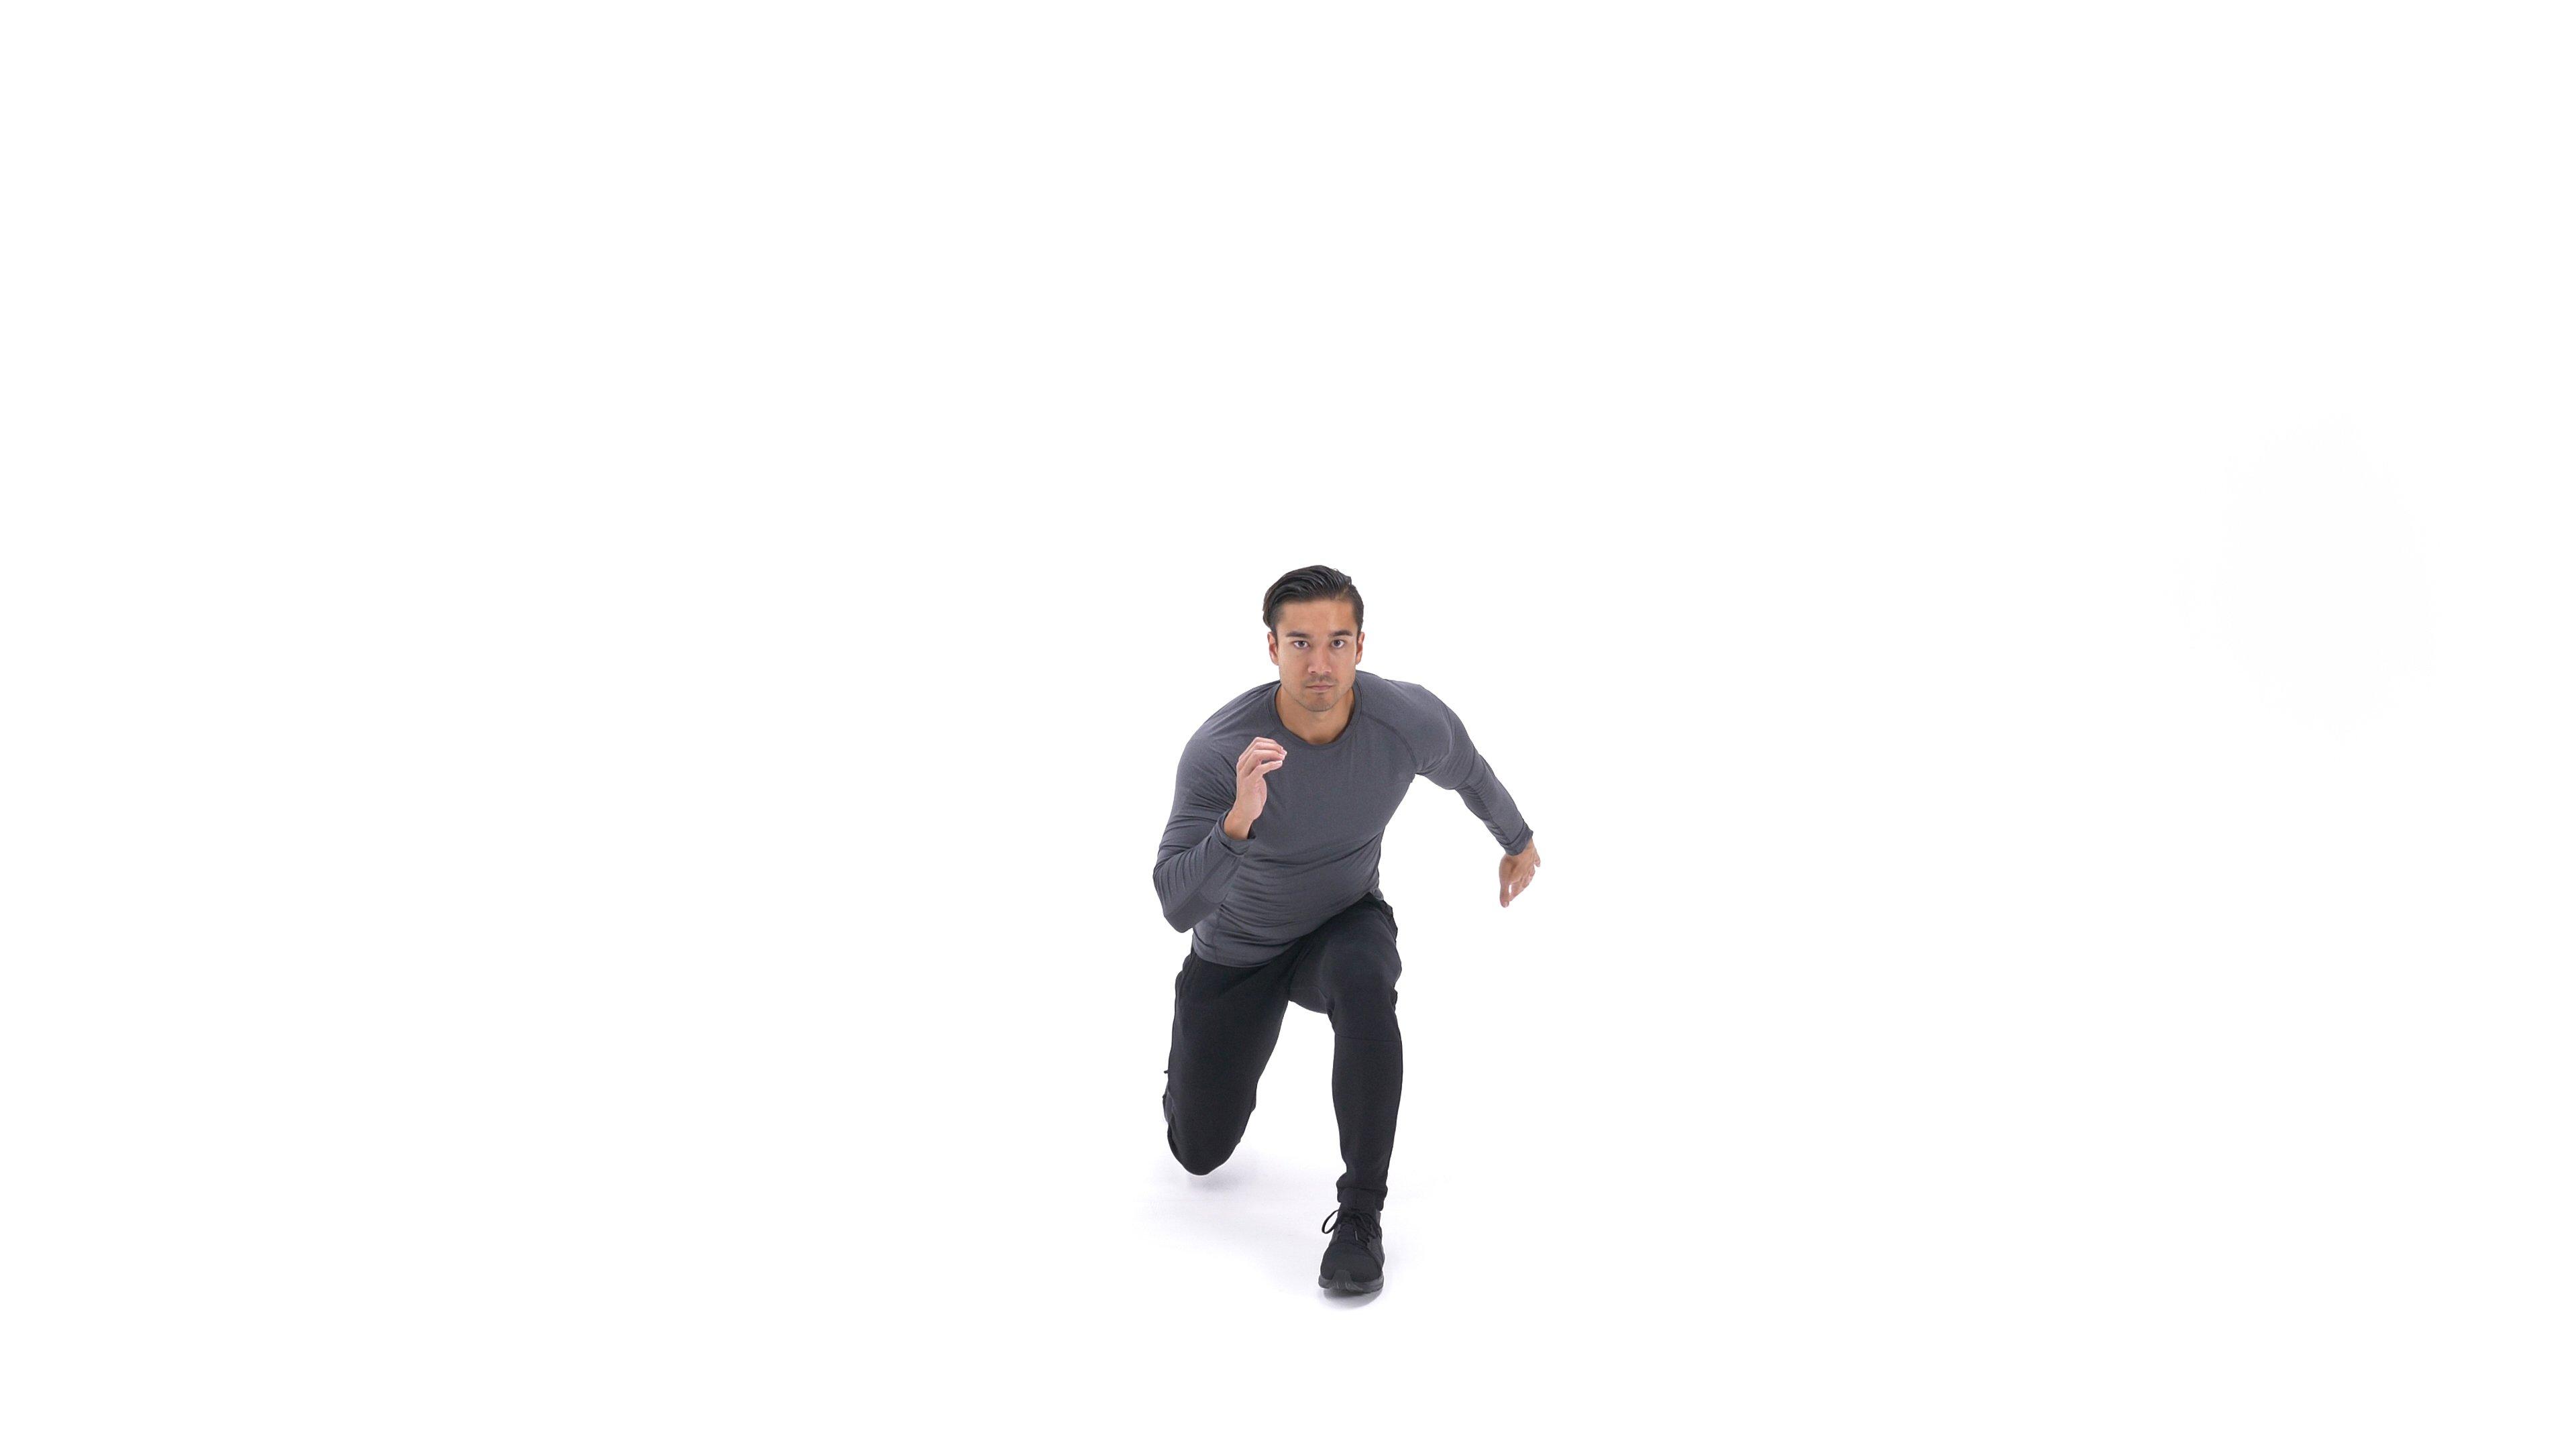 Lunge Heel Kick image